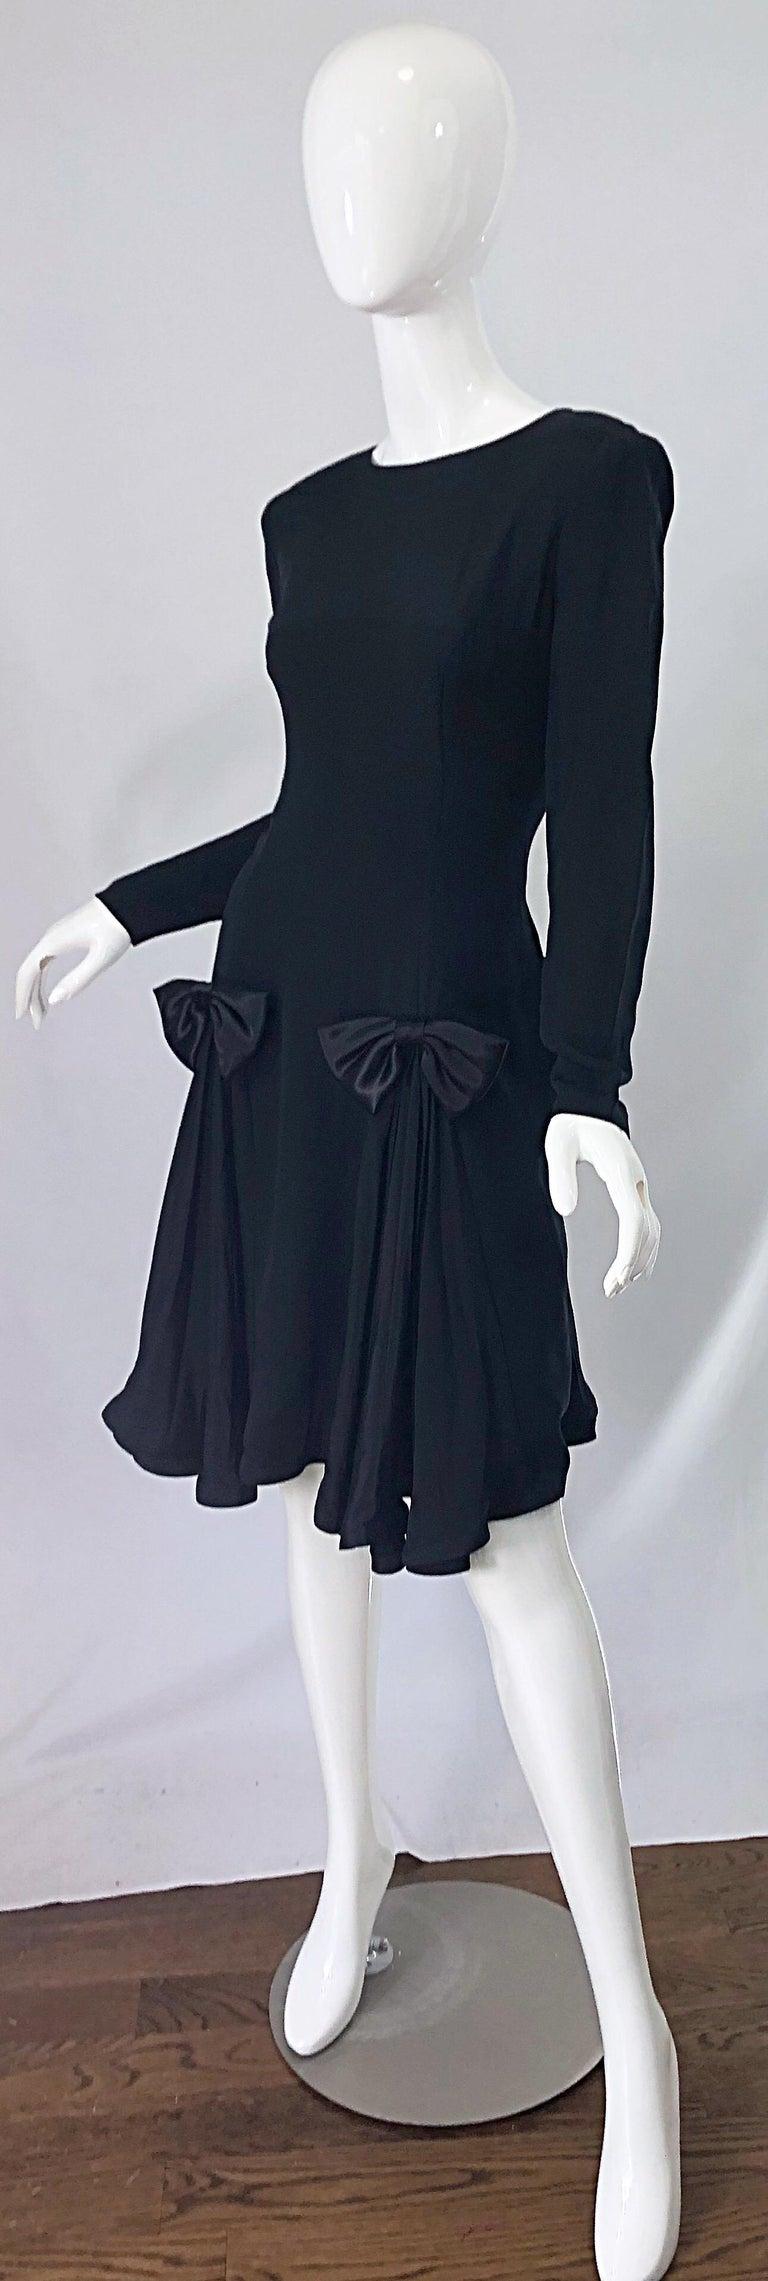 Vintage Pierre Cardin Size 8 Black Silk 1990s Long Sleeve 90s Bow Dress For Sale 1